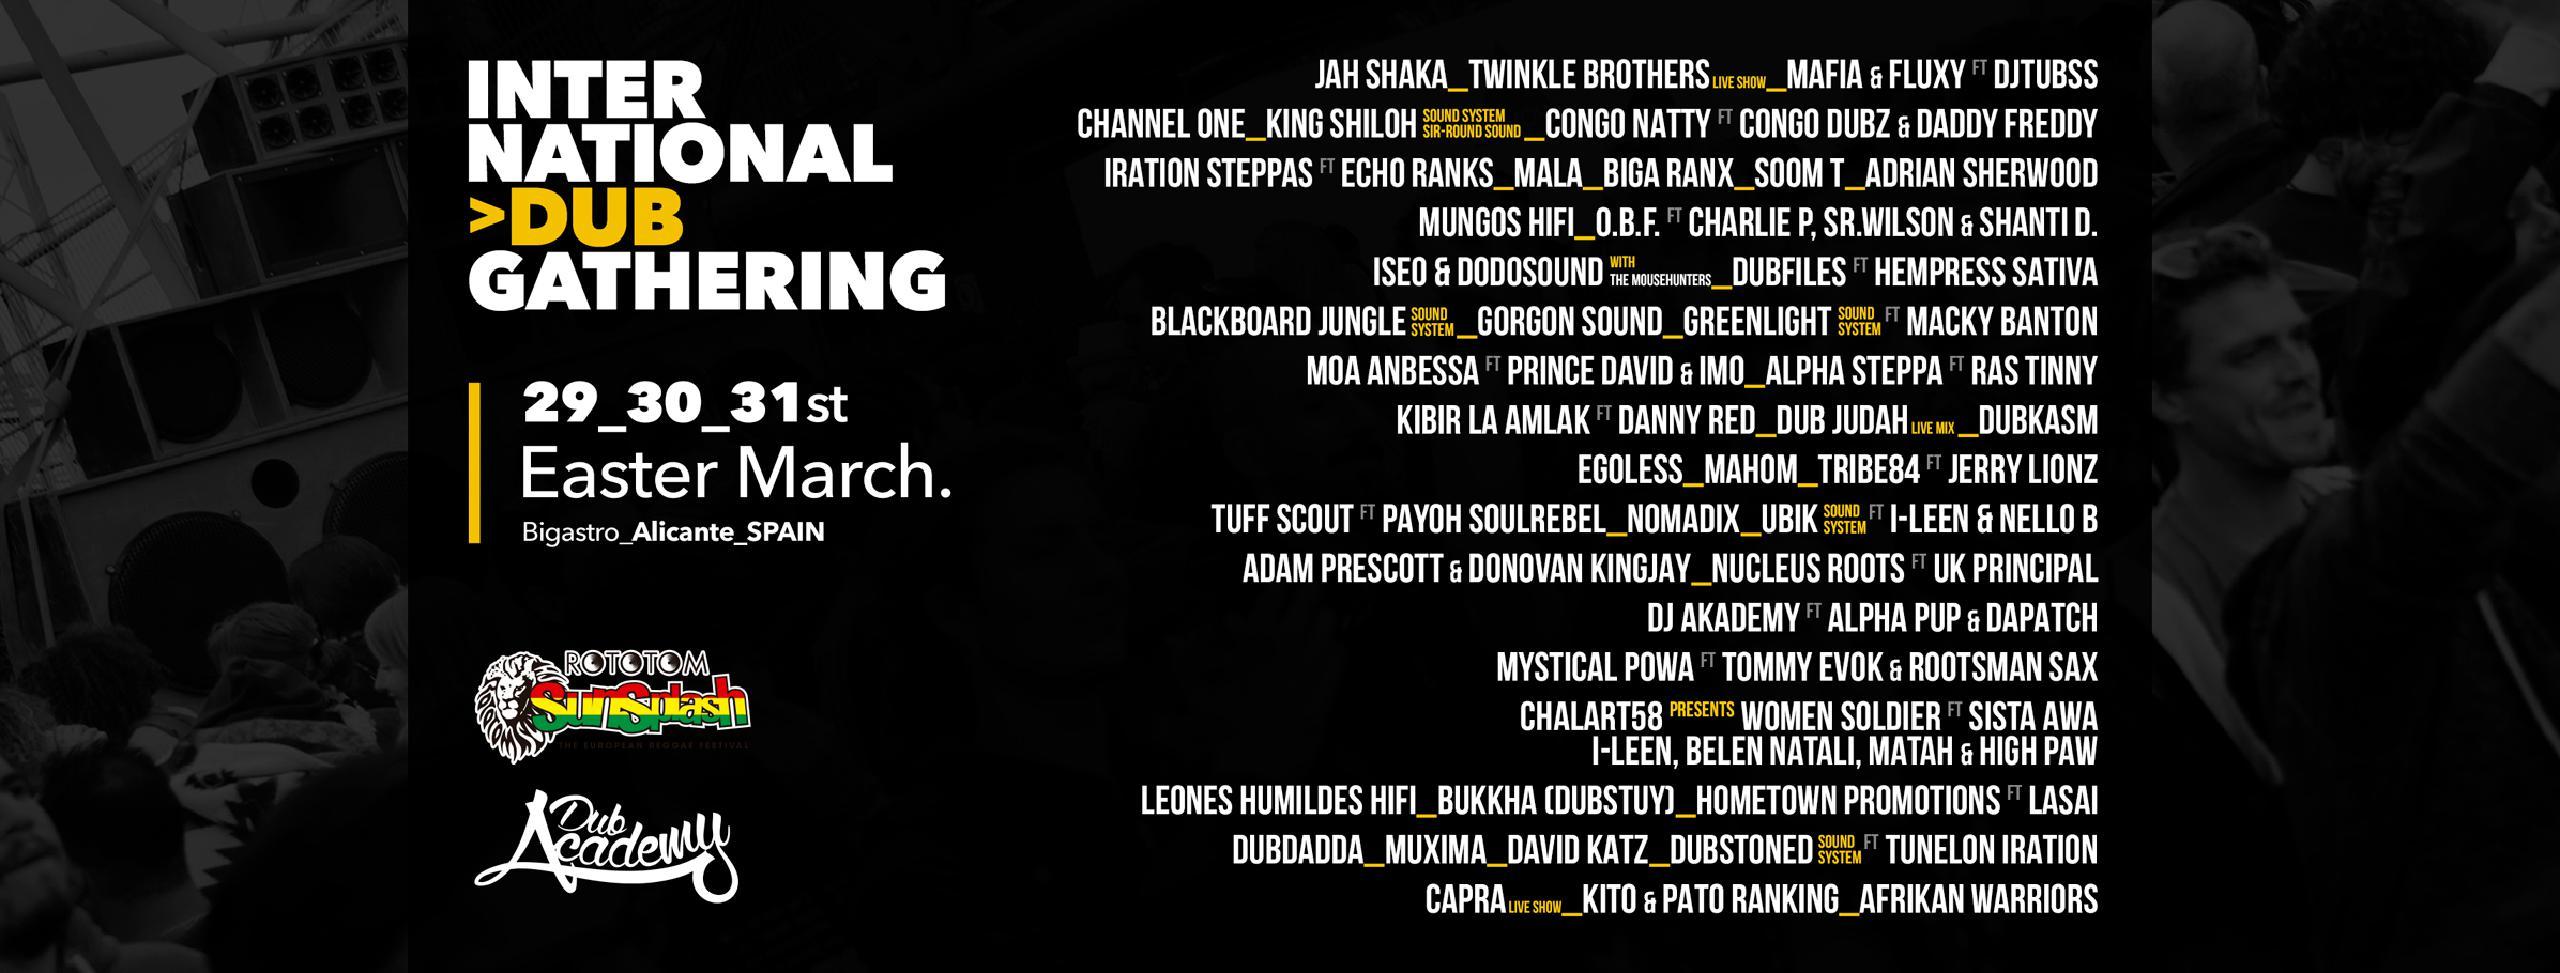 Cartel International Dub Gathering 2018 Line-up confirmaciones